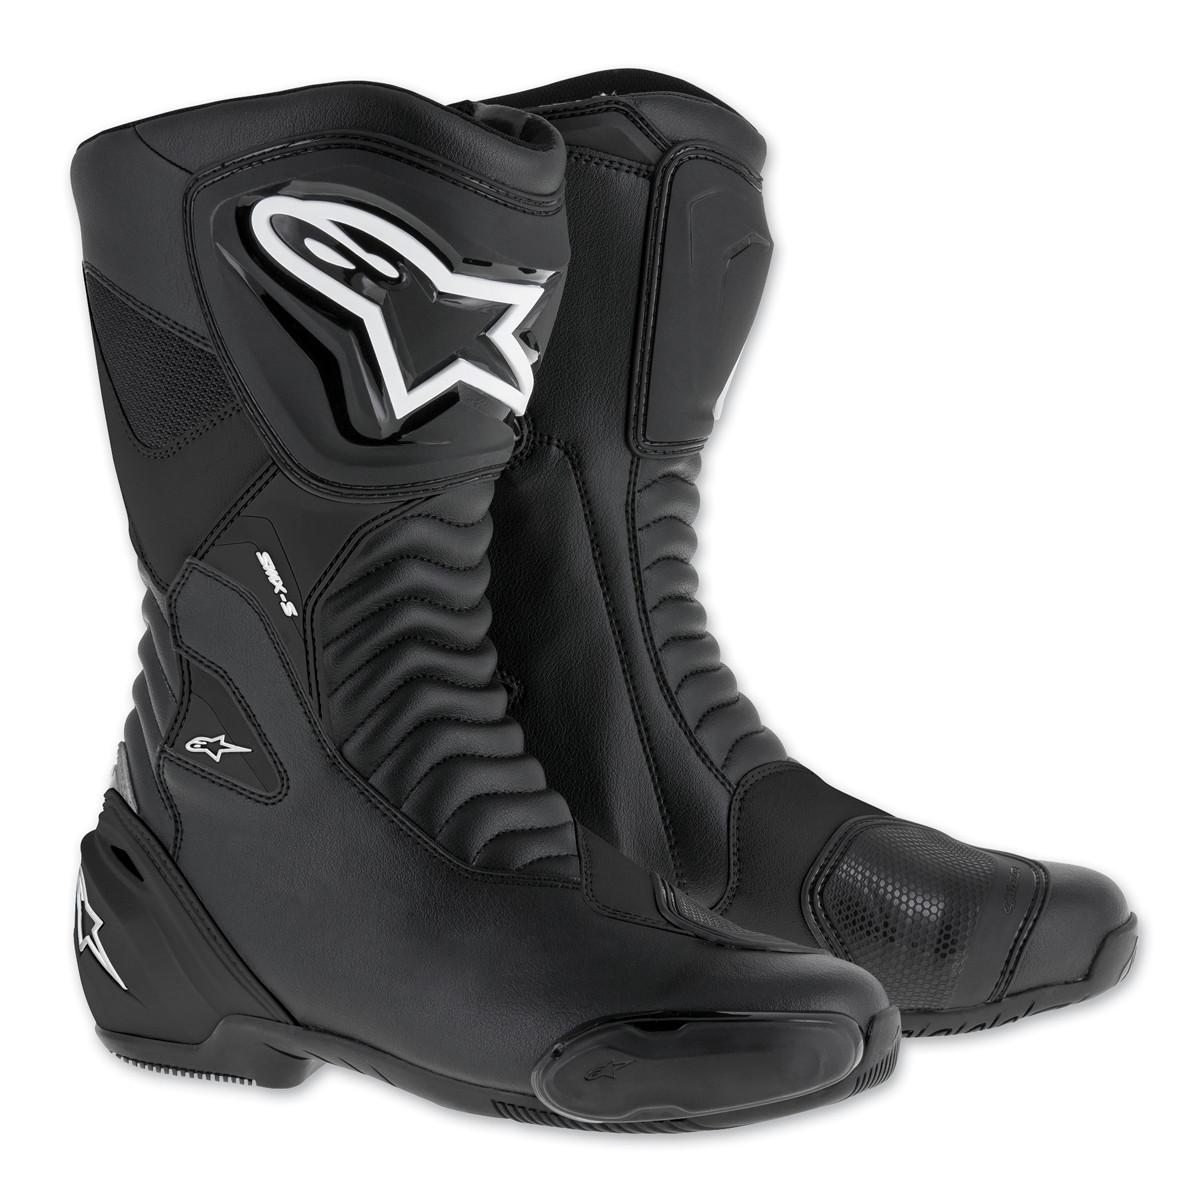 "Обувь Alpinestars SMX S black ""43"", арт. 2223517 1100, арт. 2223517 1100"